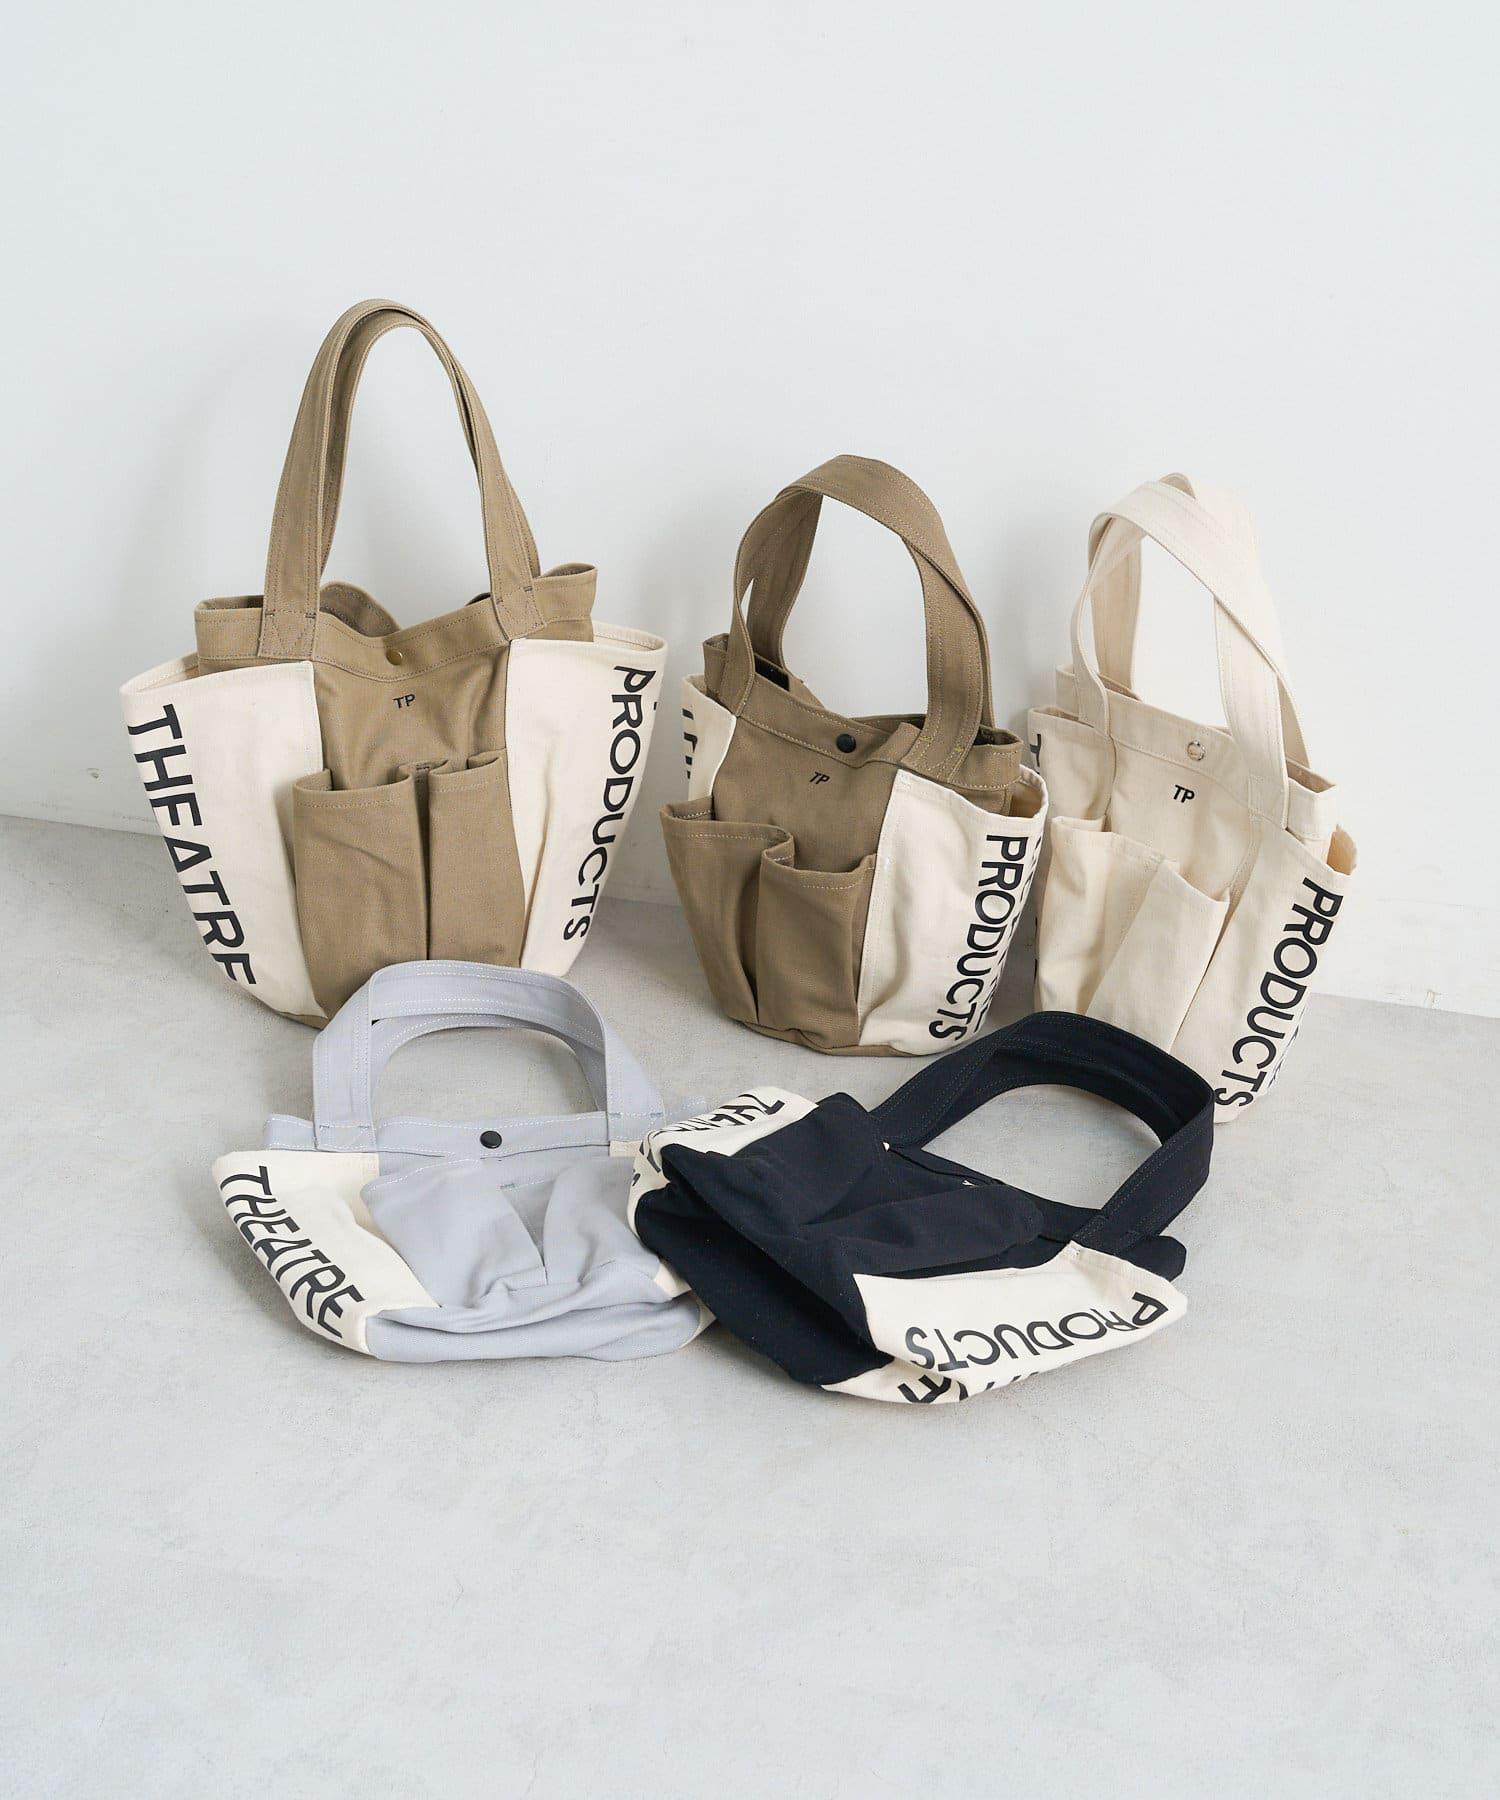 pual ce cin(ピュアルセシン) 【WEB限定】THEATRE PRODUCTS ガーデンバッグS